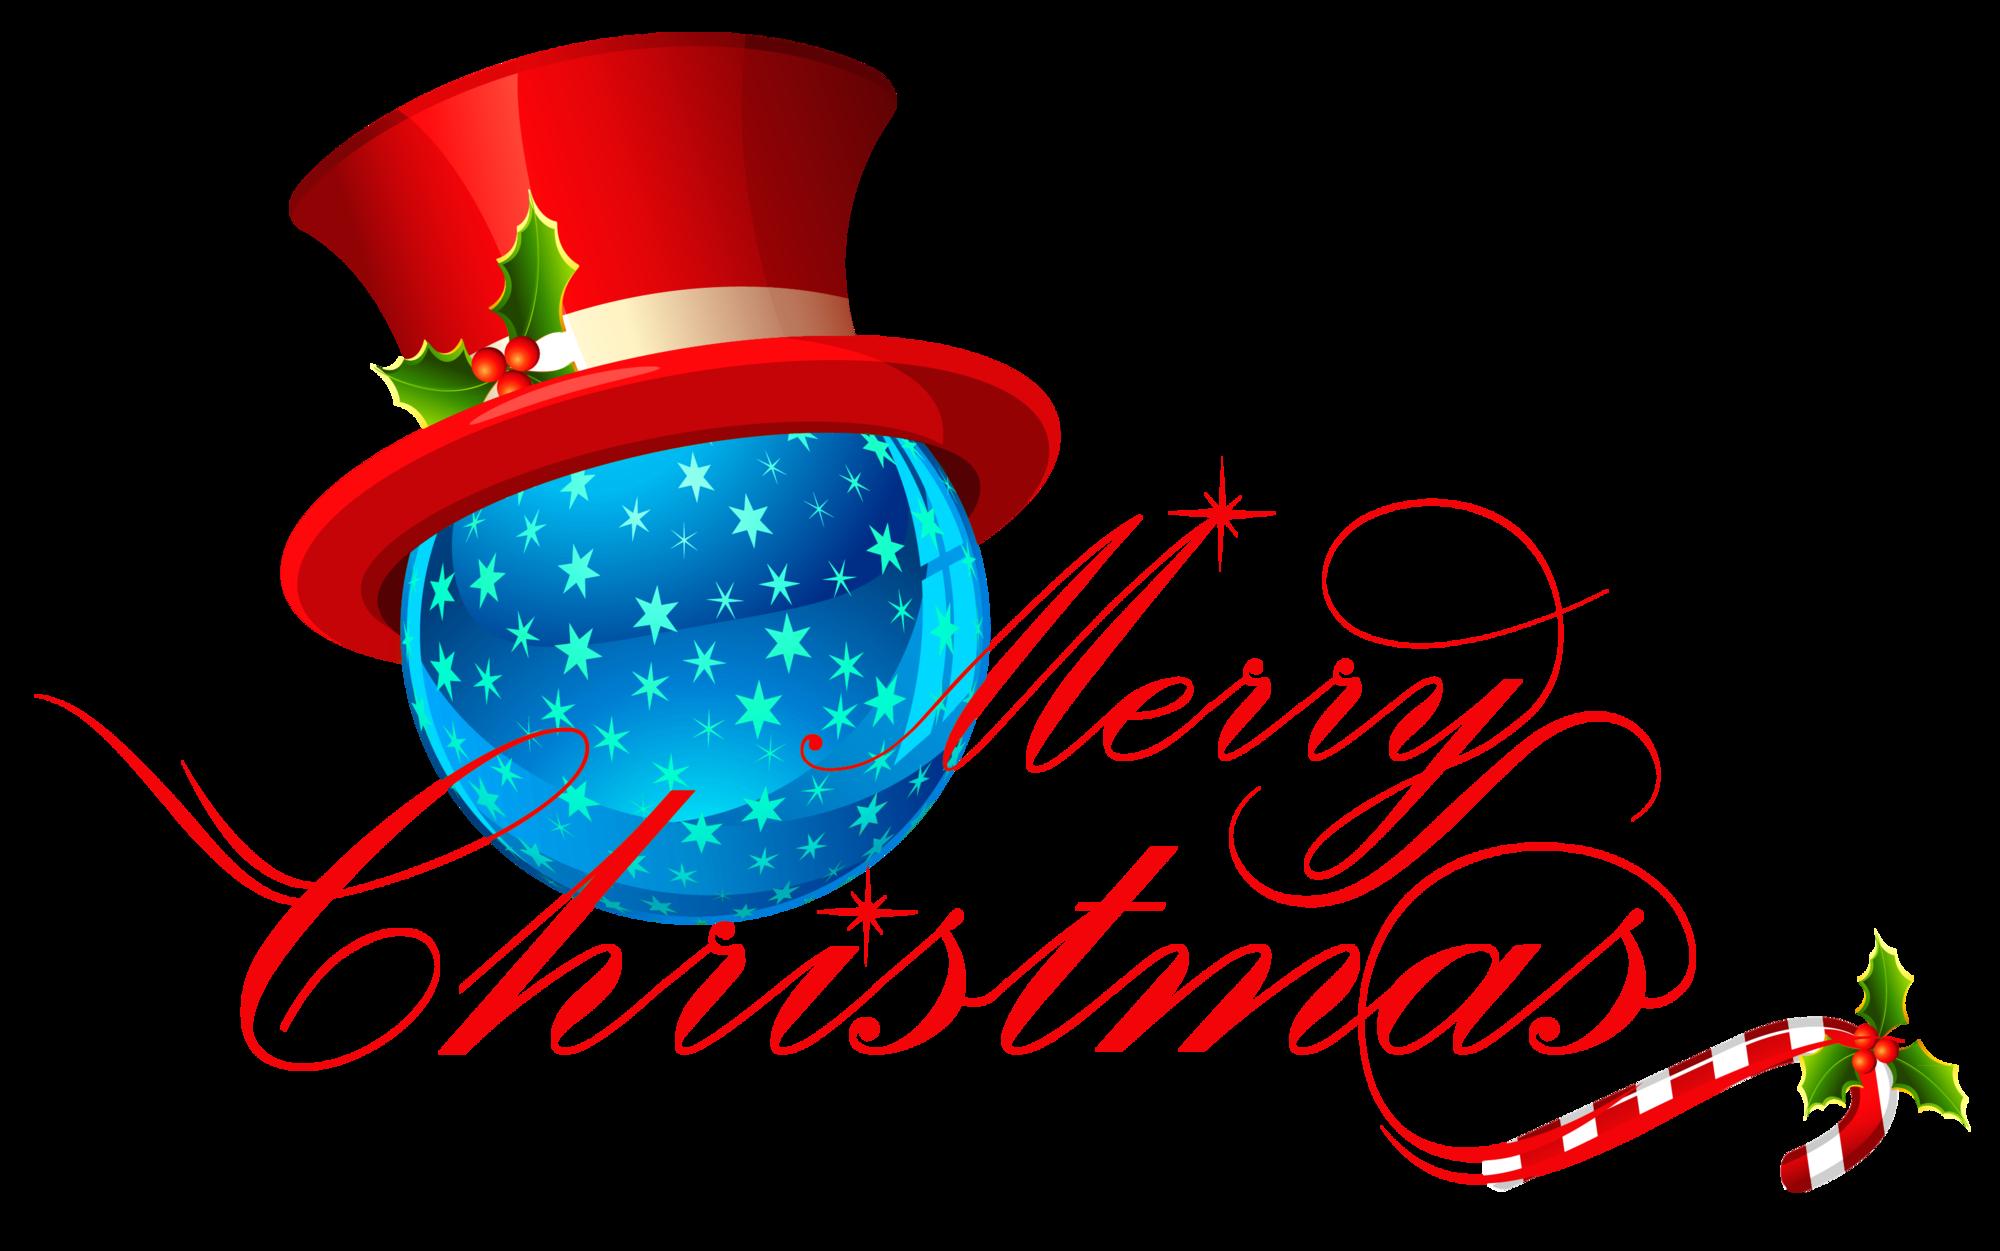 Paw patrol clipart transparent clipart transparent Image - Transparent Merry Christmas with Blue Ornament Clipart.png ... clipart transparent